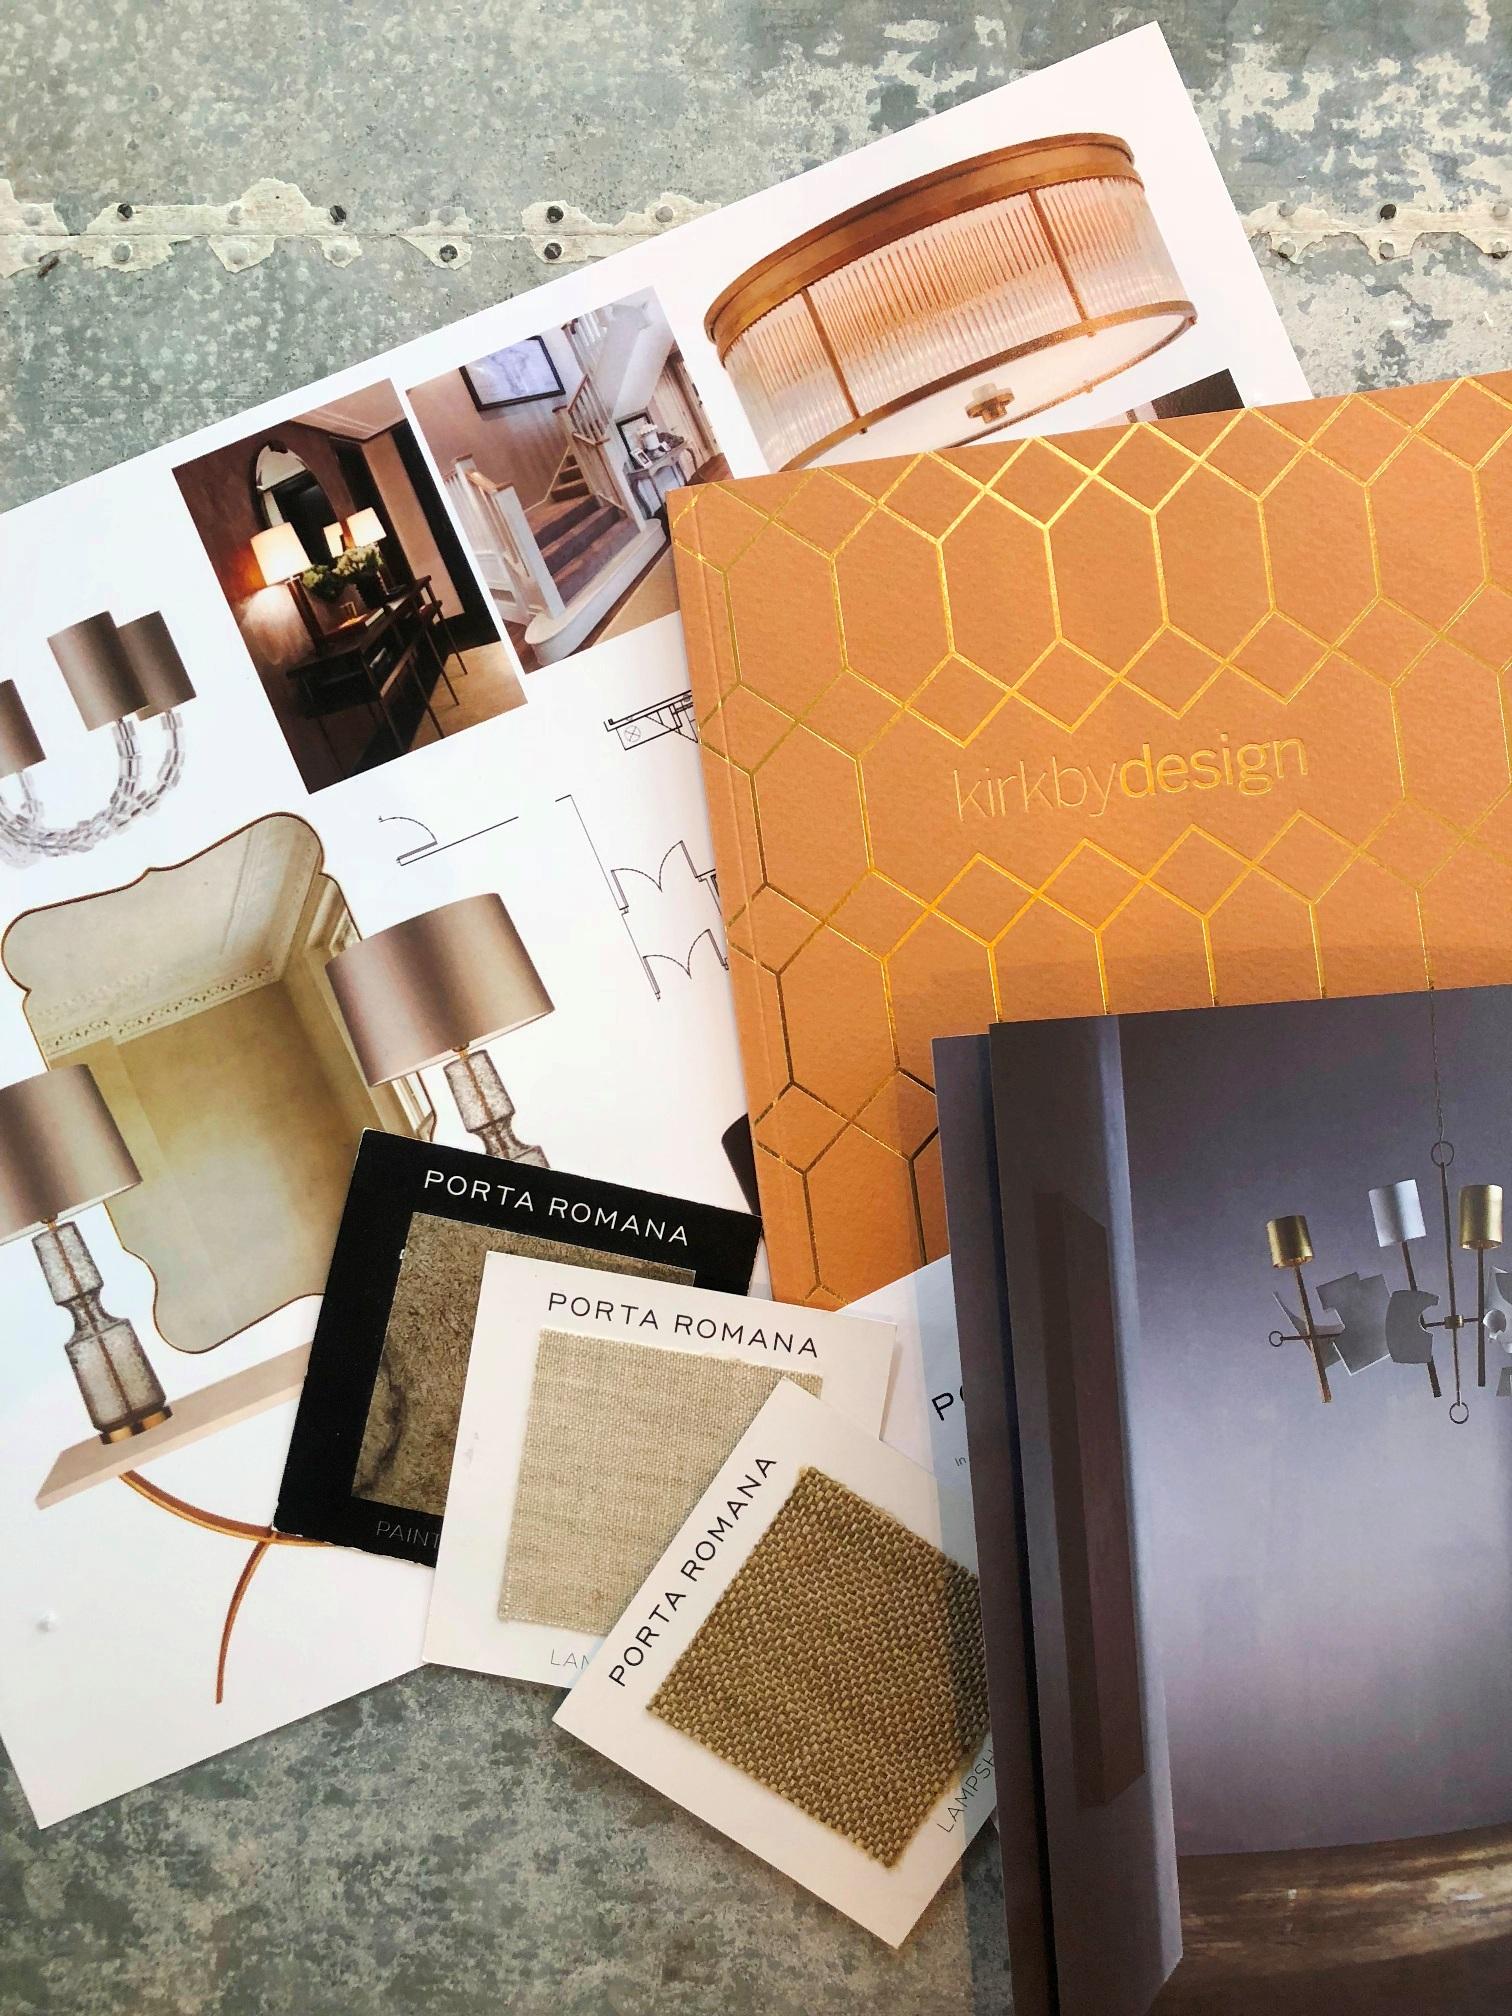 lee austin design - interior and architectural design ireland